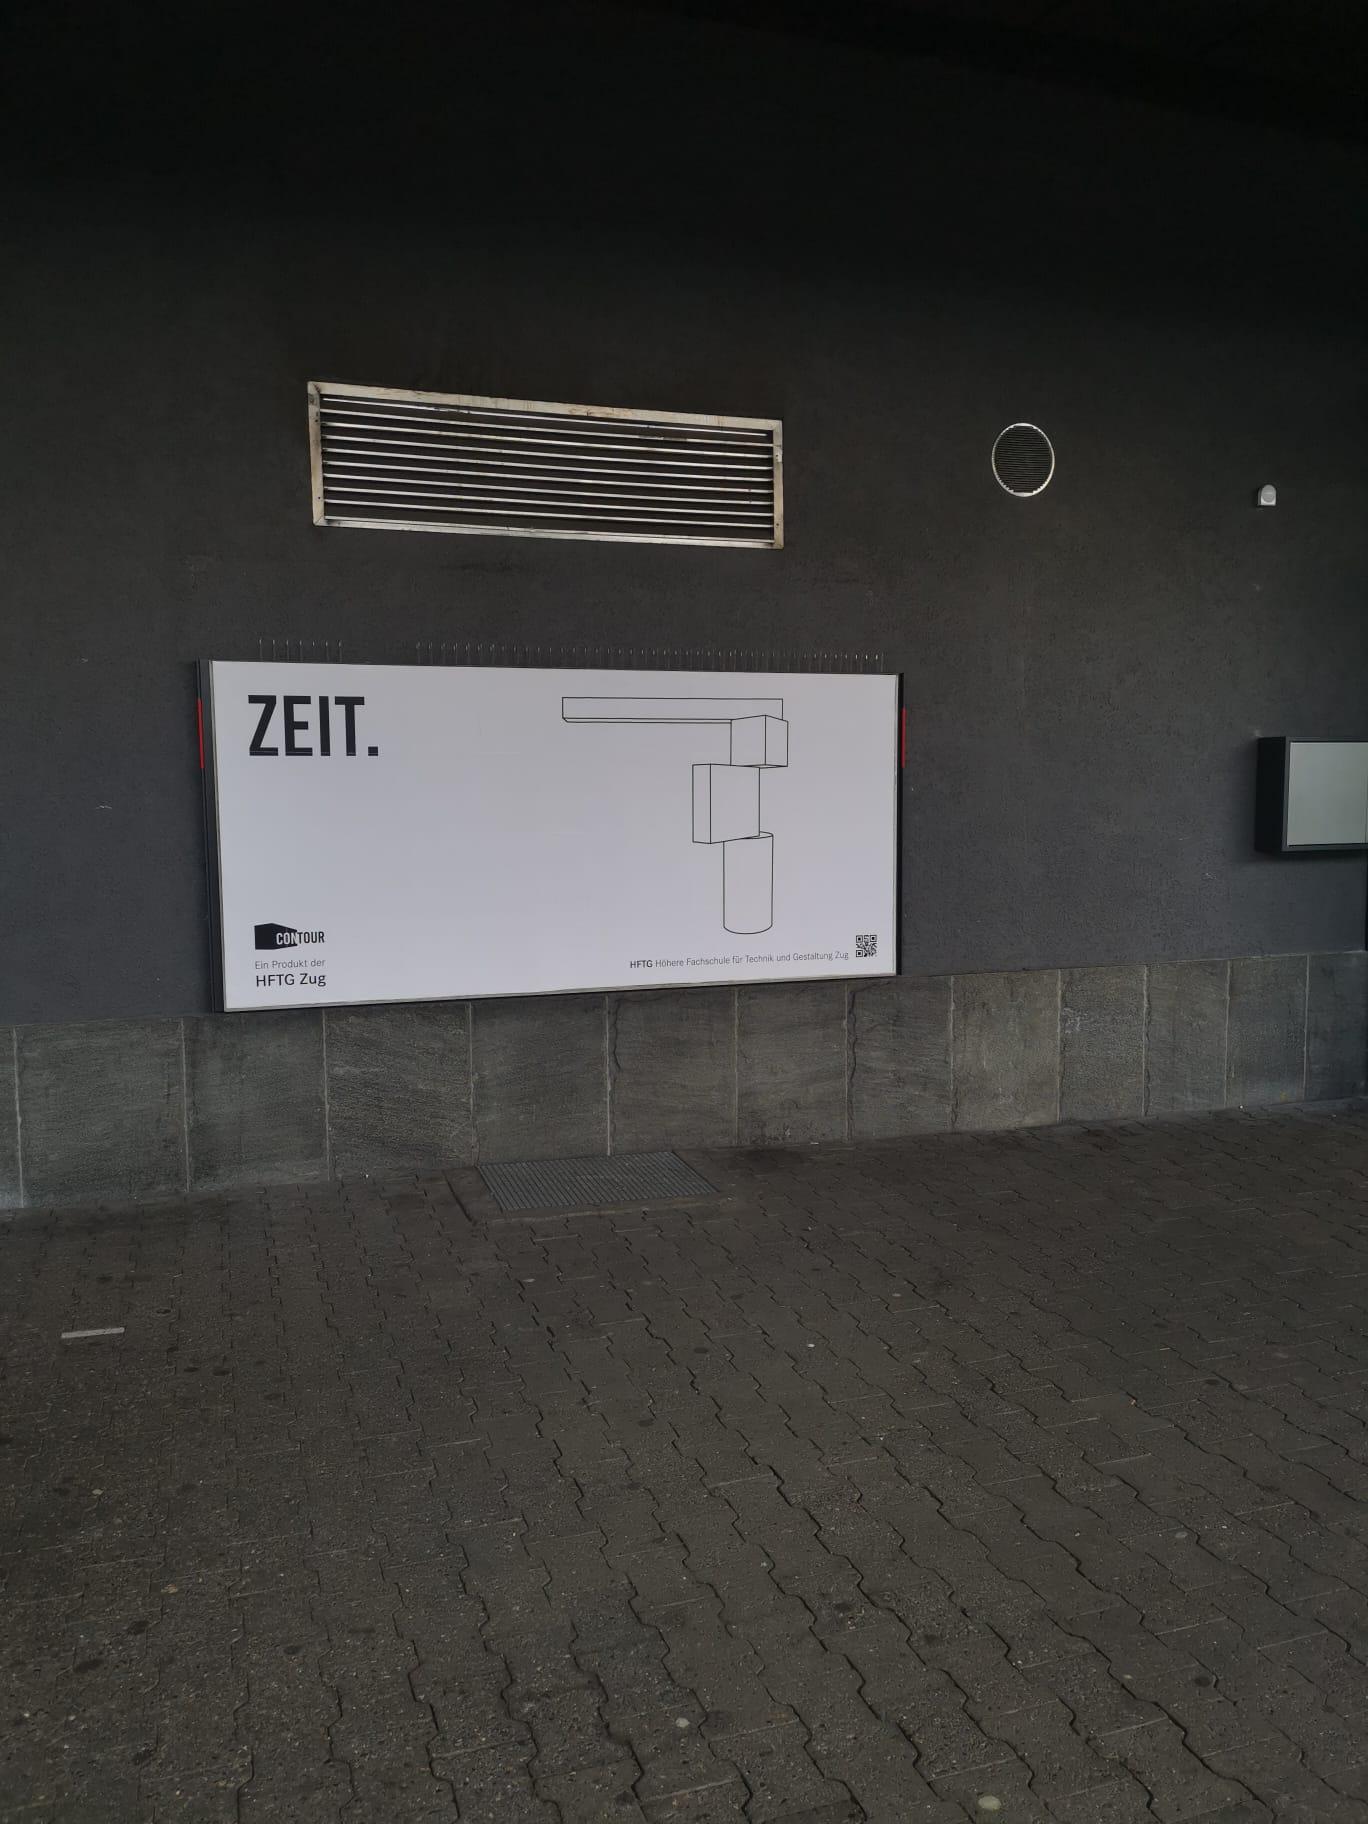 Plakat in Zug am Bahnhof